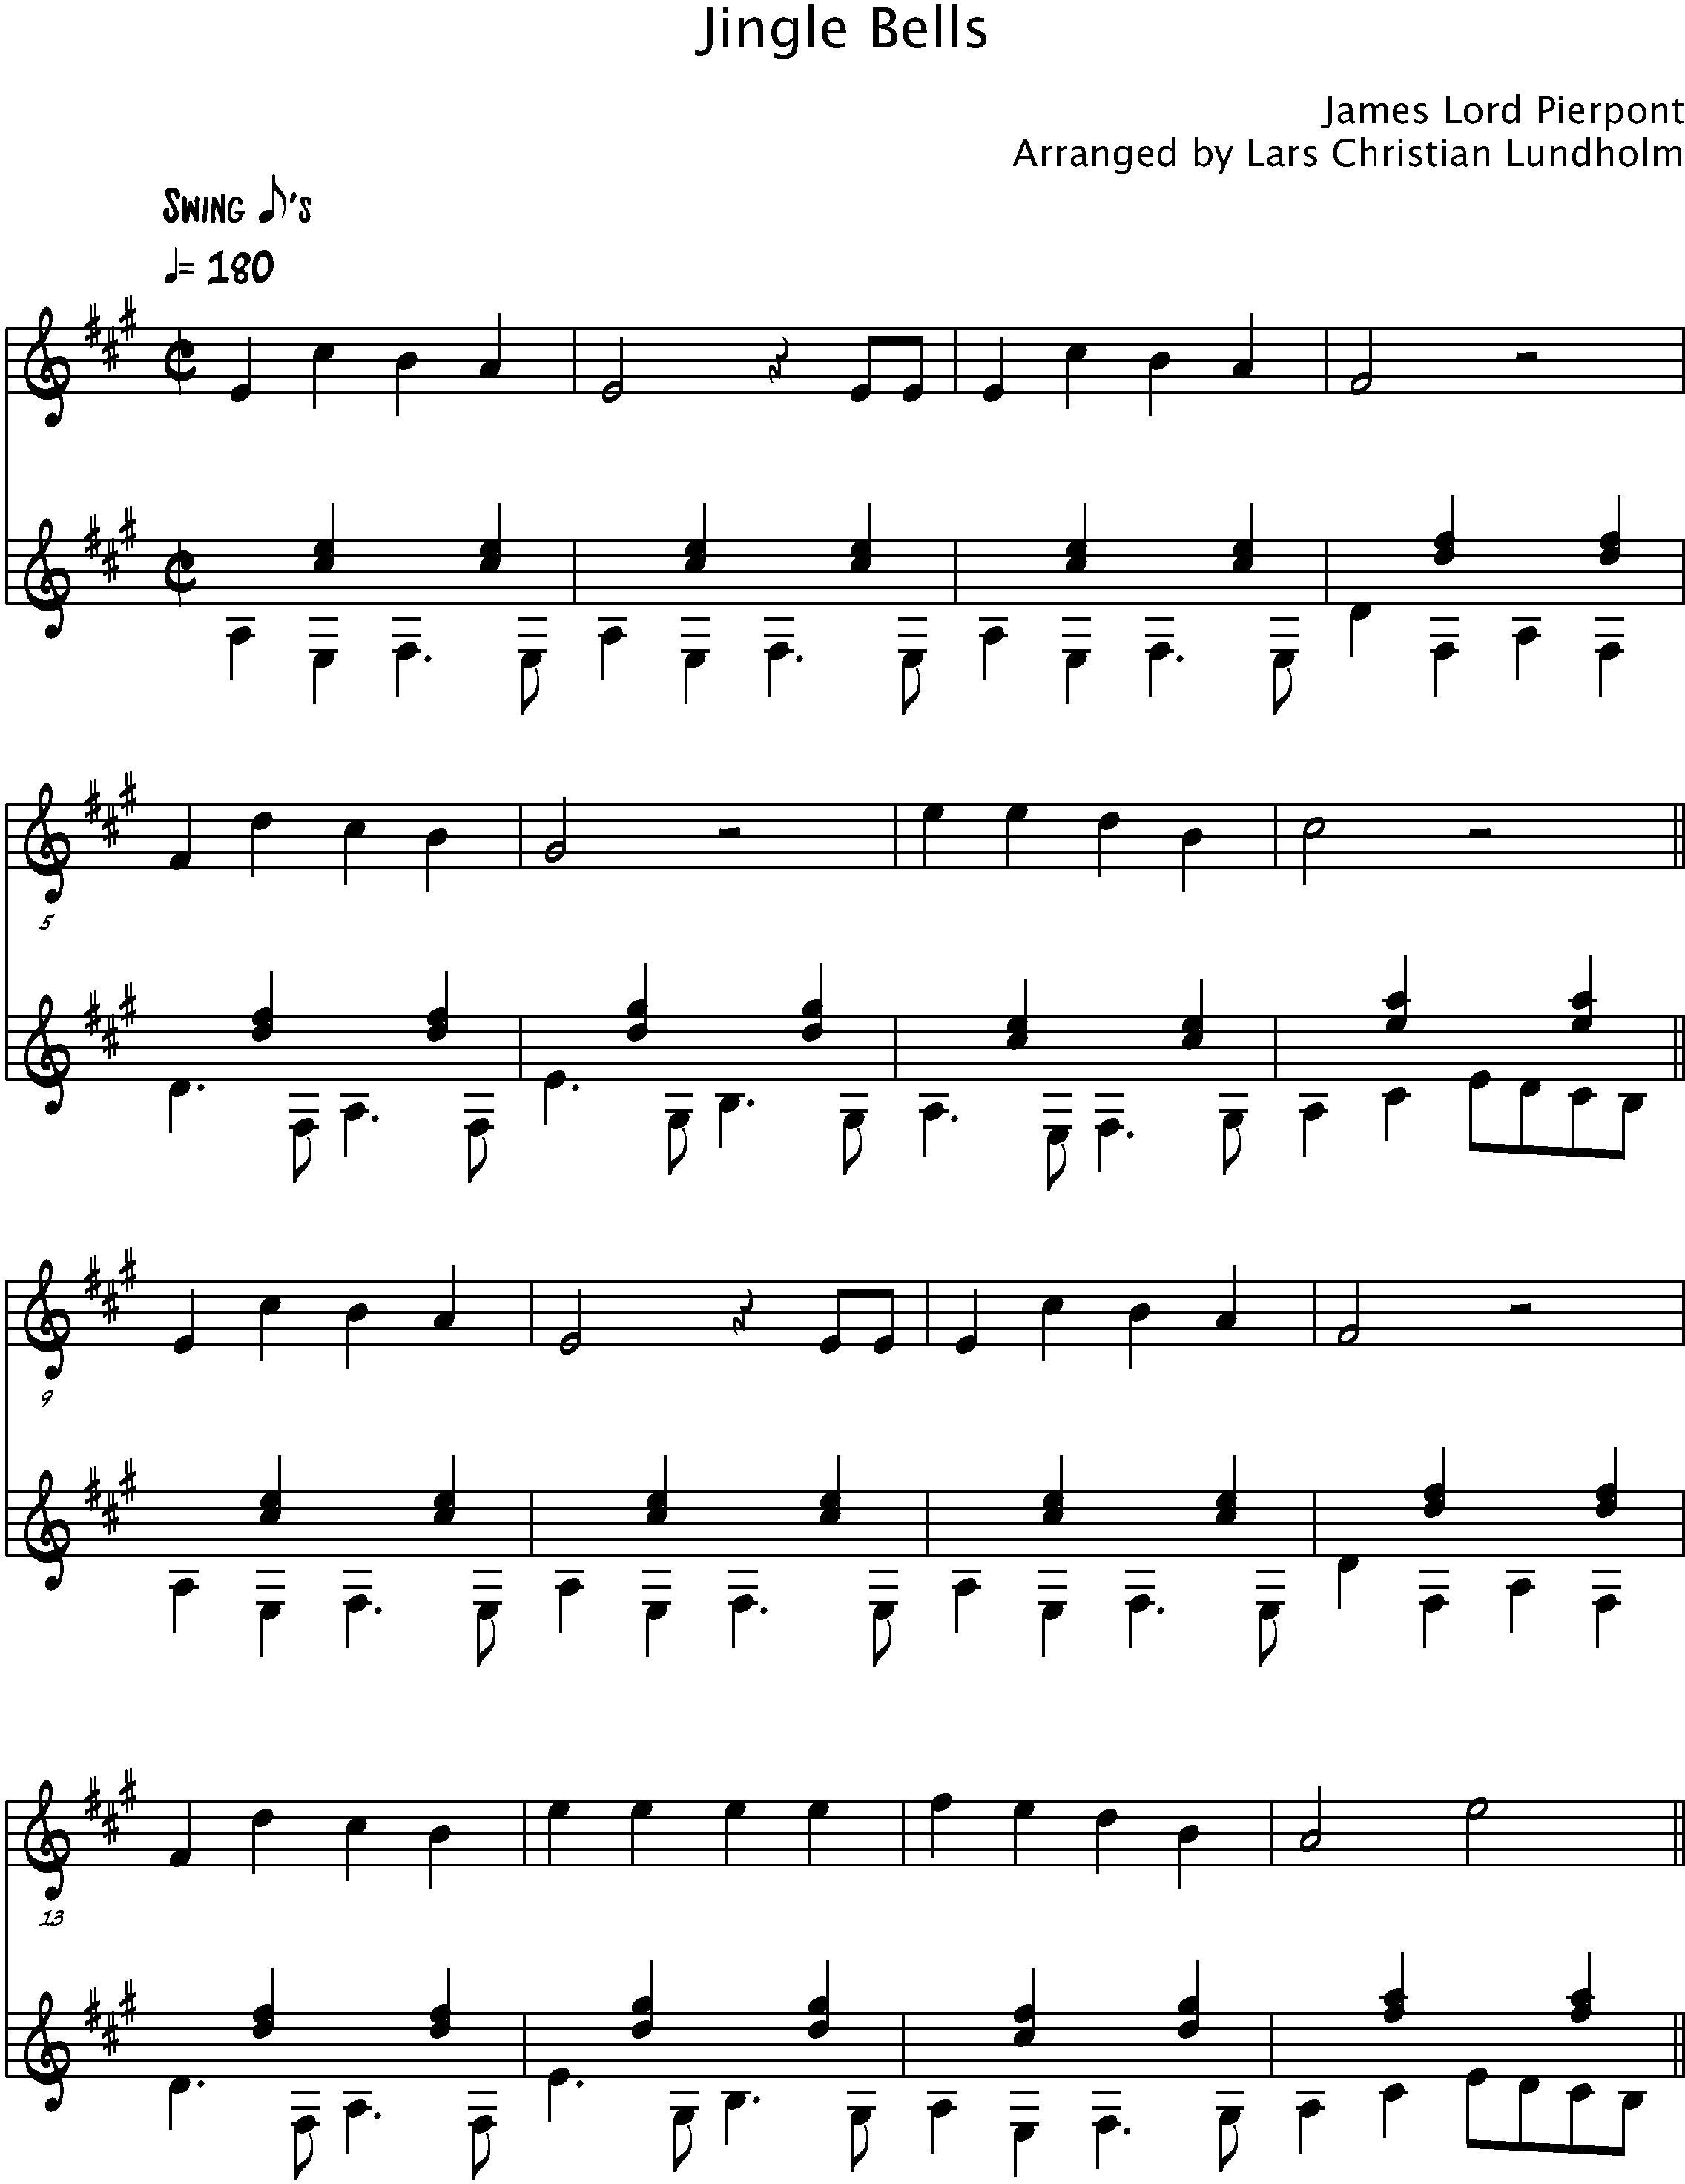 jingle bells violin sheet music - Oyu.armanmarine.co